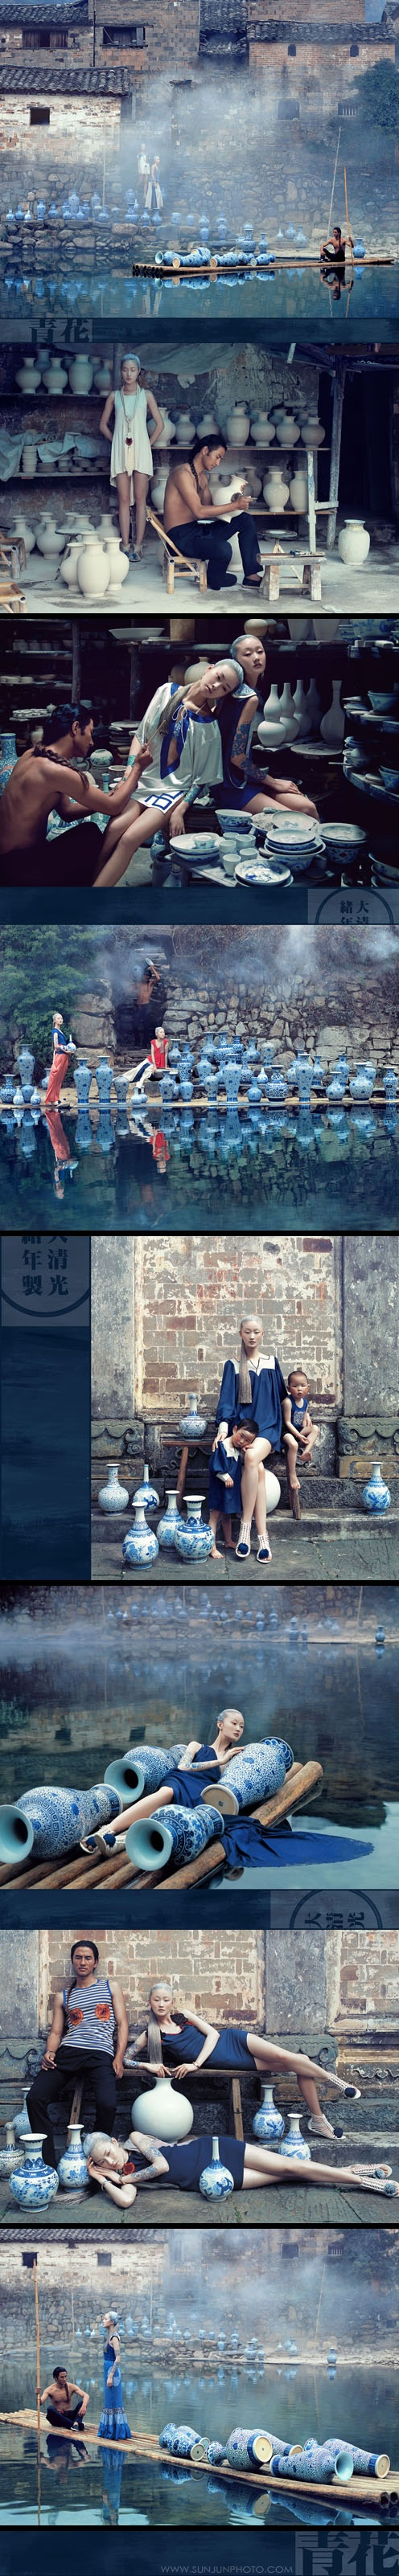 sunjunphoto.com